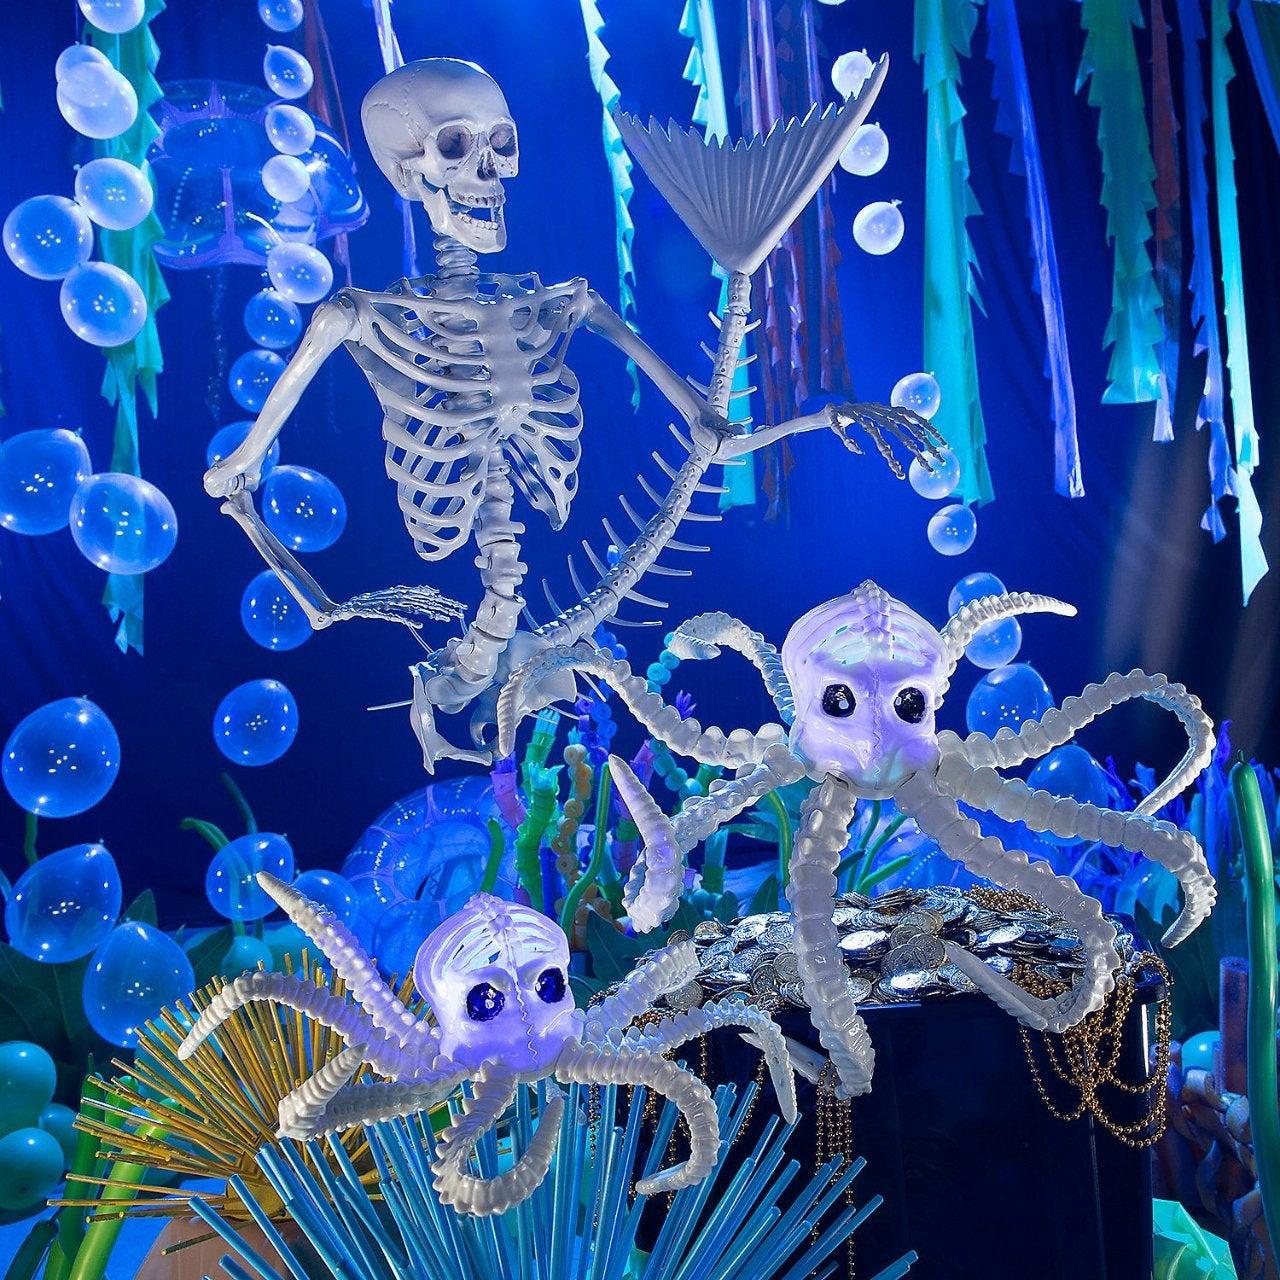 underwater-skeleton-assortment_13959183